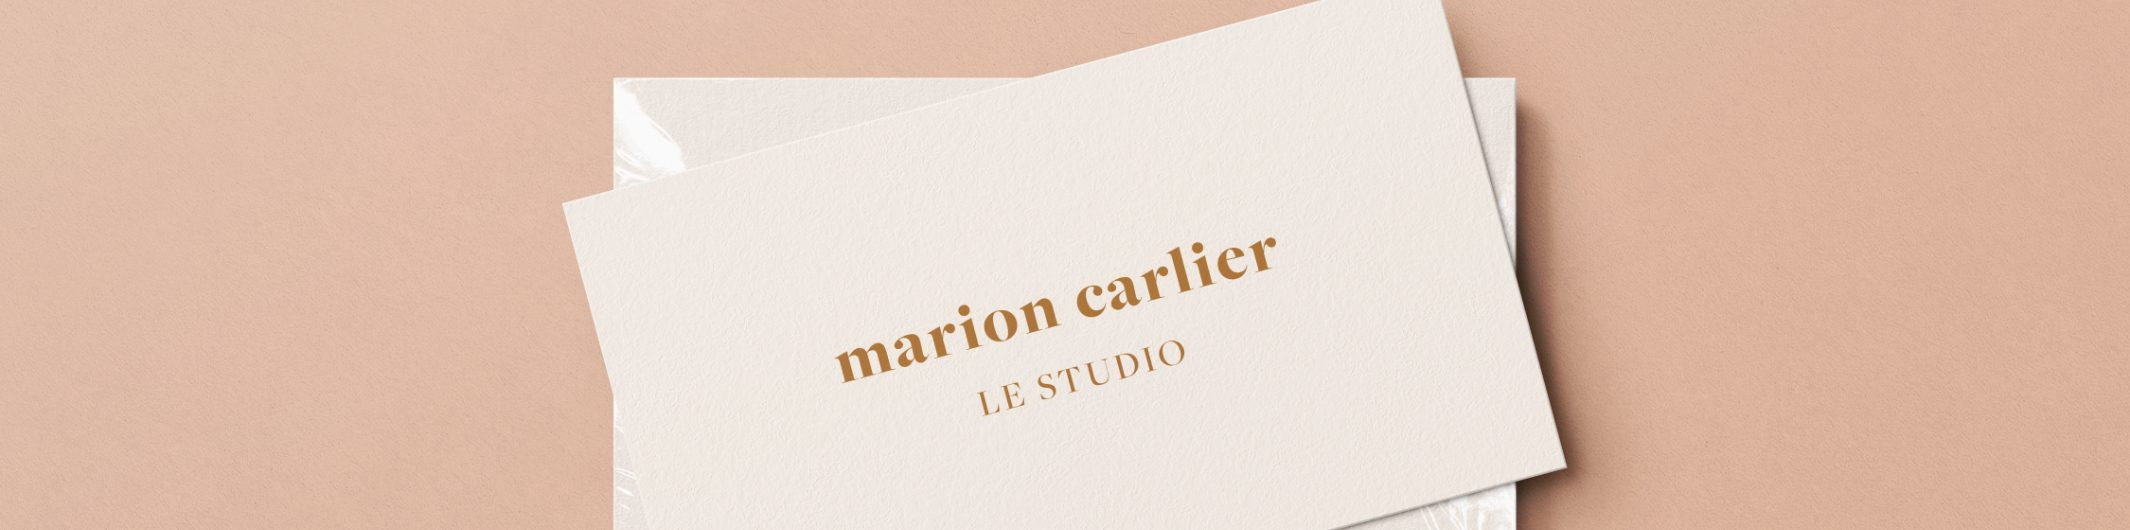 marion-carlier-alogo-bandeau-2